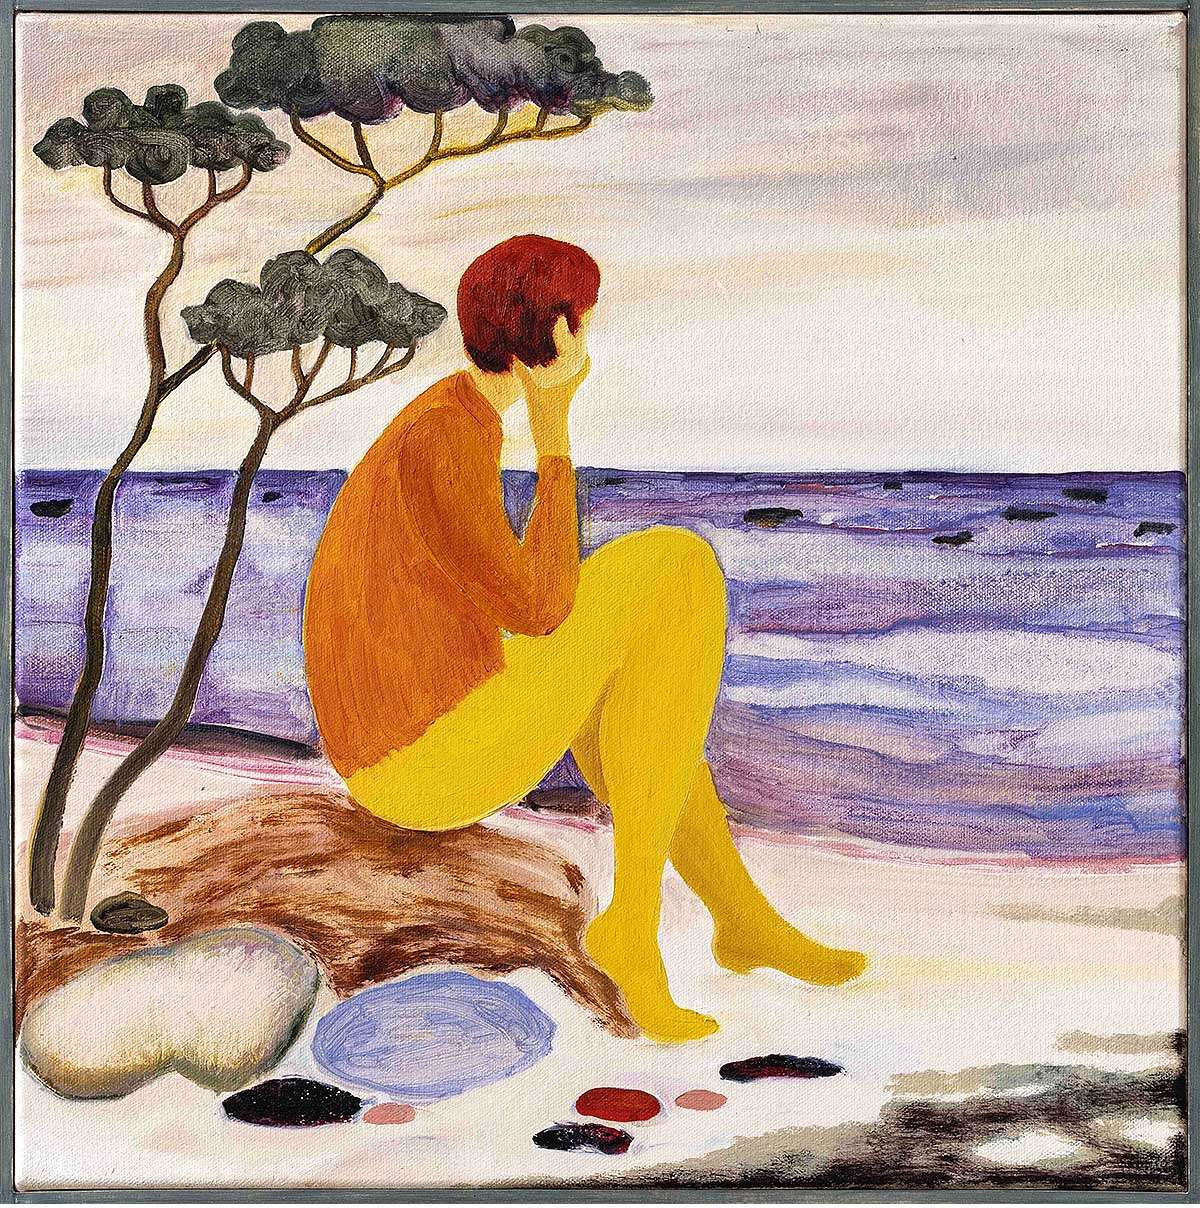 Freya Douglas-Morris, 'The slowness of time', oil on canvas